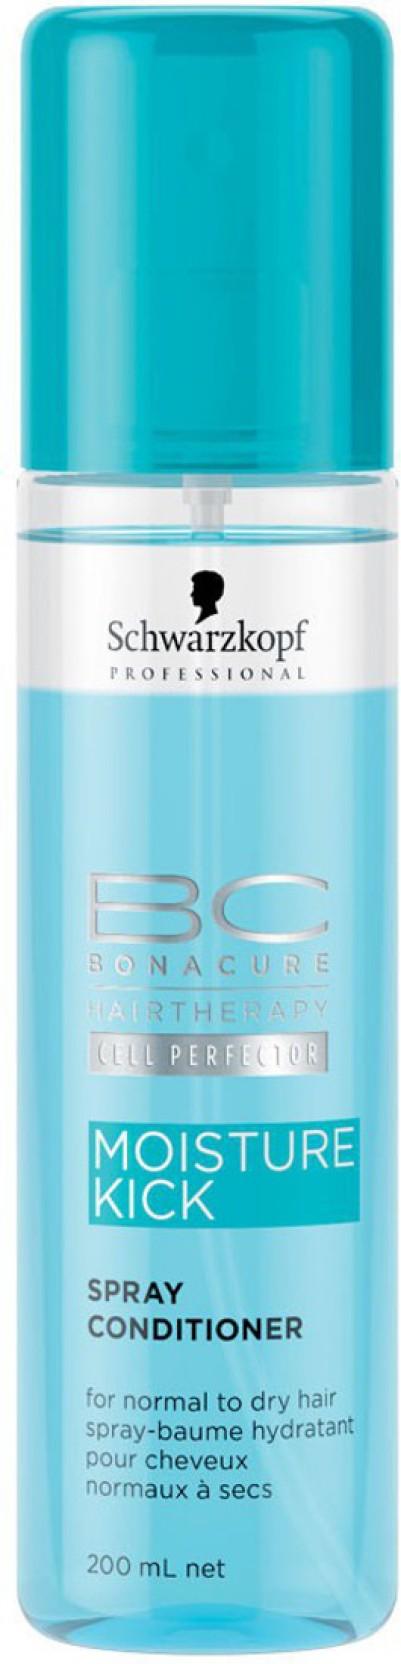 Schwarzkopf Moisture Kick Spray Conditioner - Price in India 69fe3da564faf